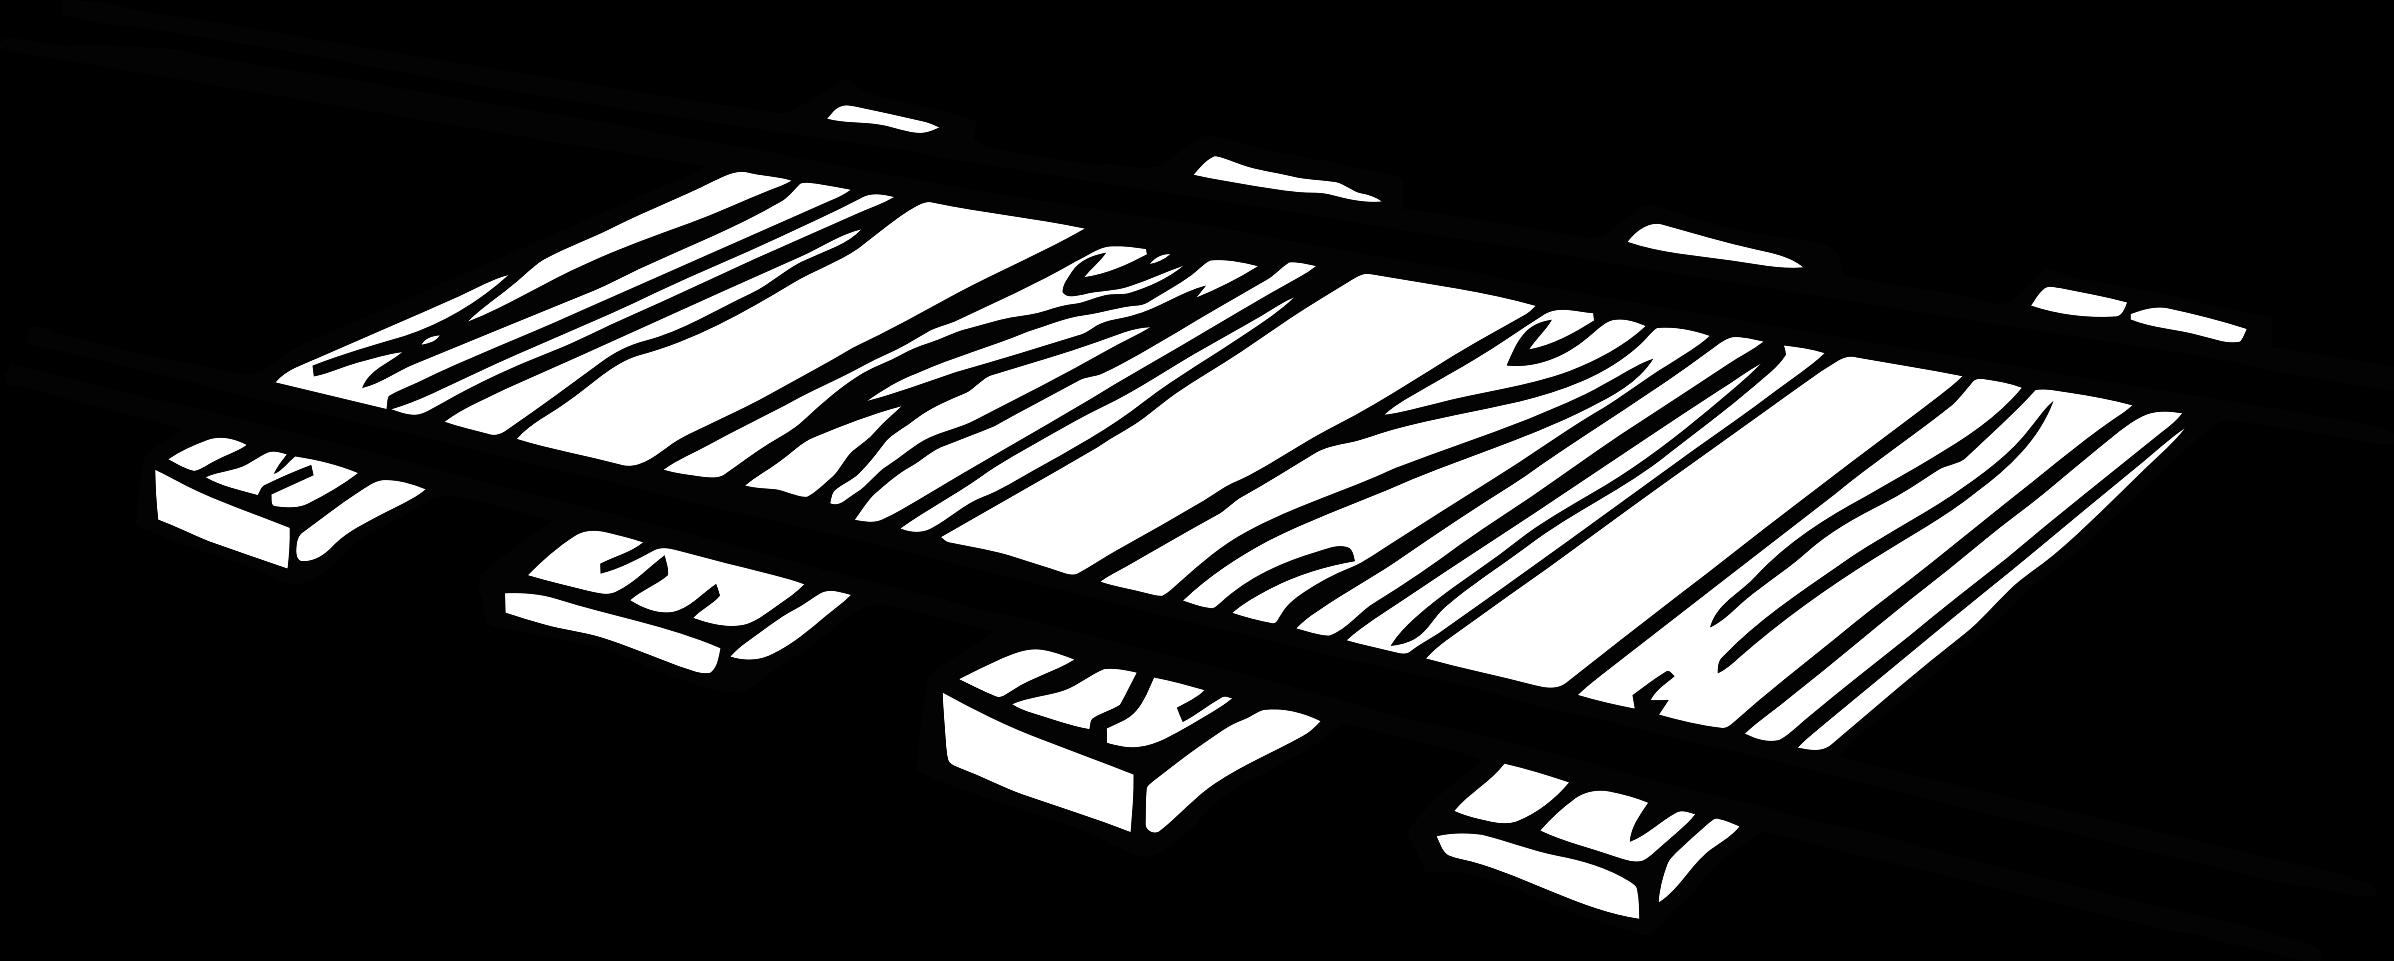 Railroad Tracks Lineart by TikiGiki